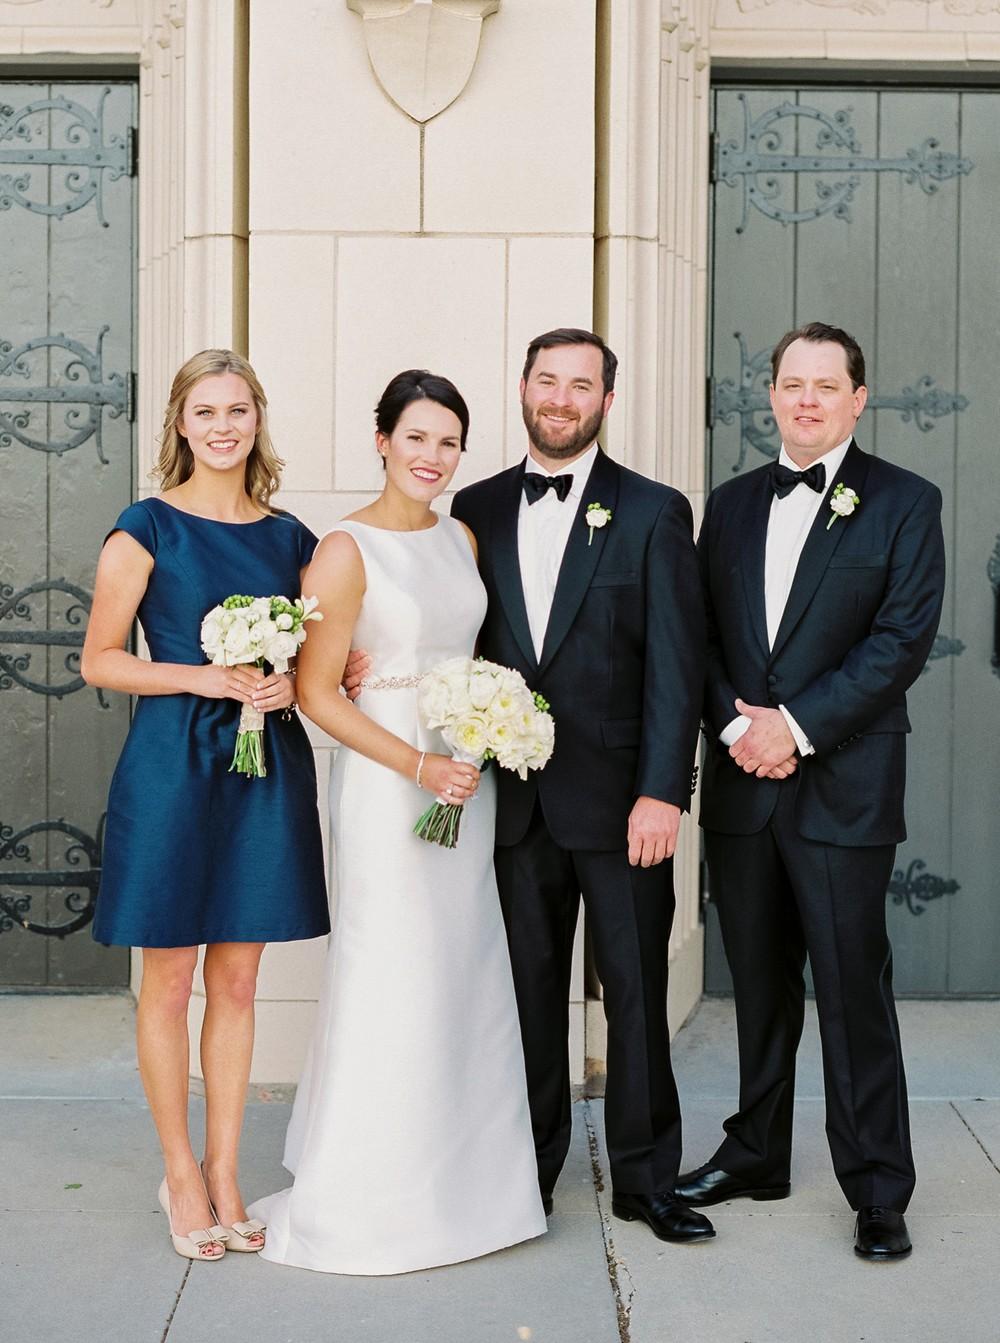 Becca Lea Photography- Dallas, Austin, Destination Fine Art wedding photographer